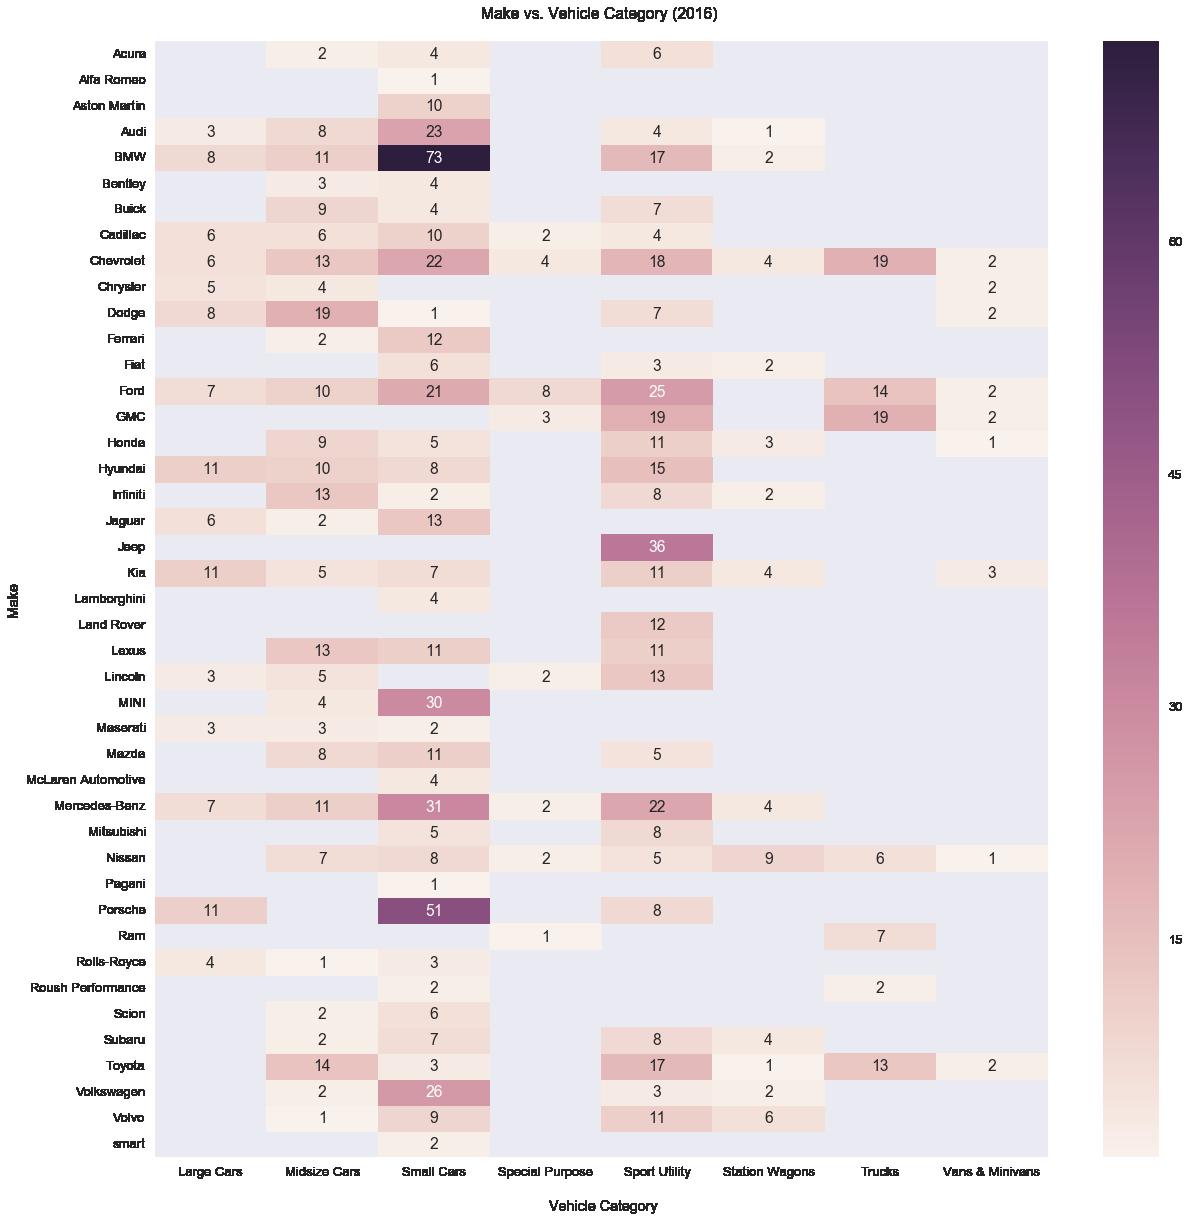 make_category_heatmap.png